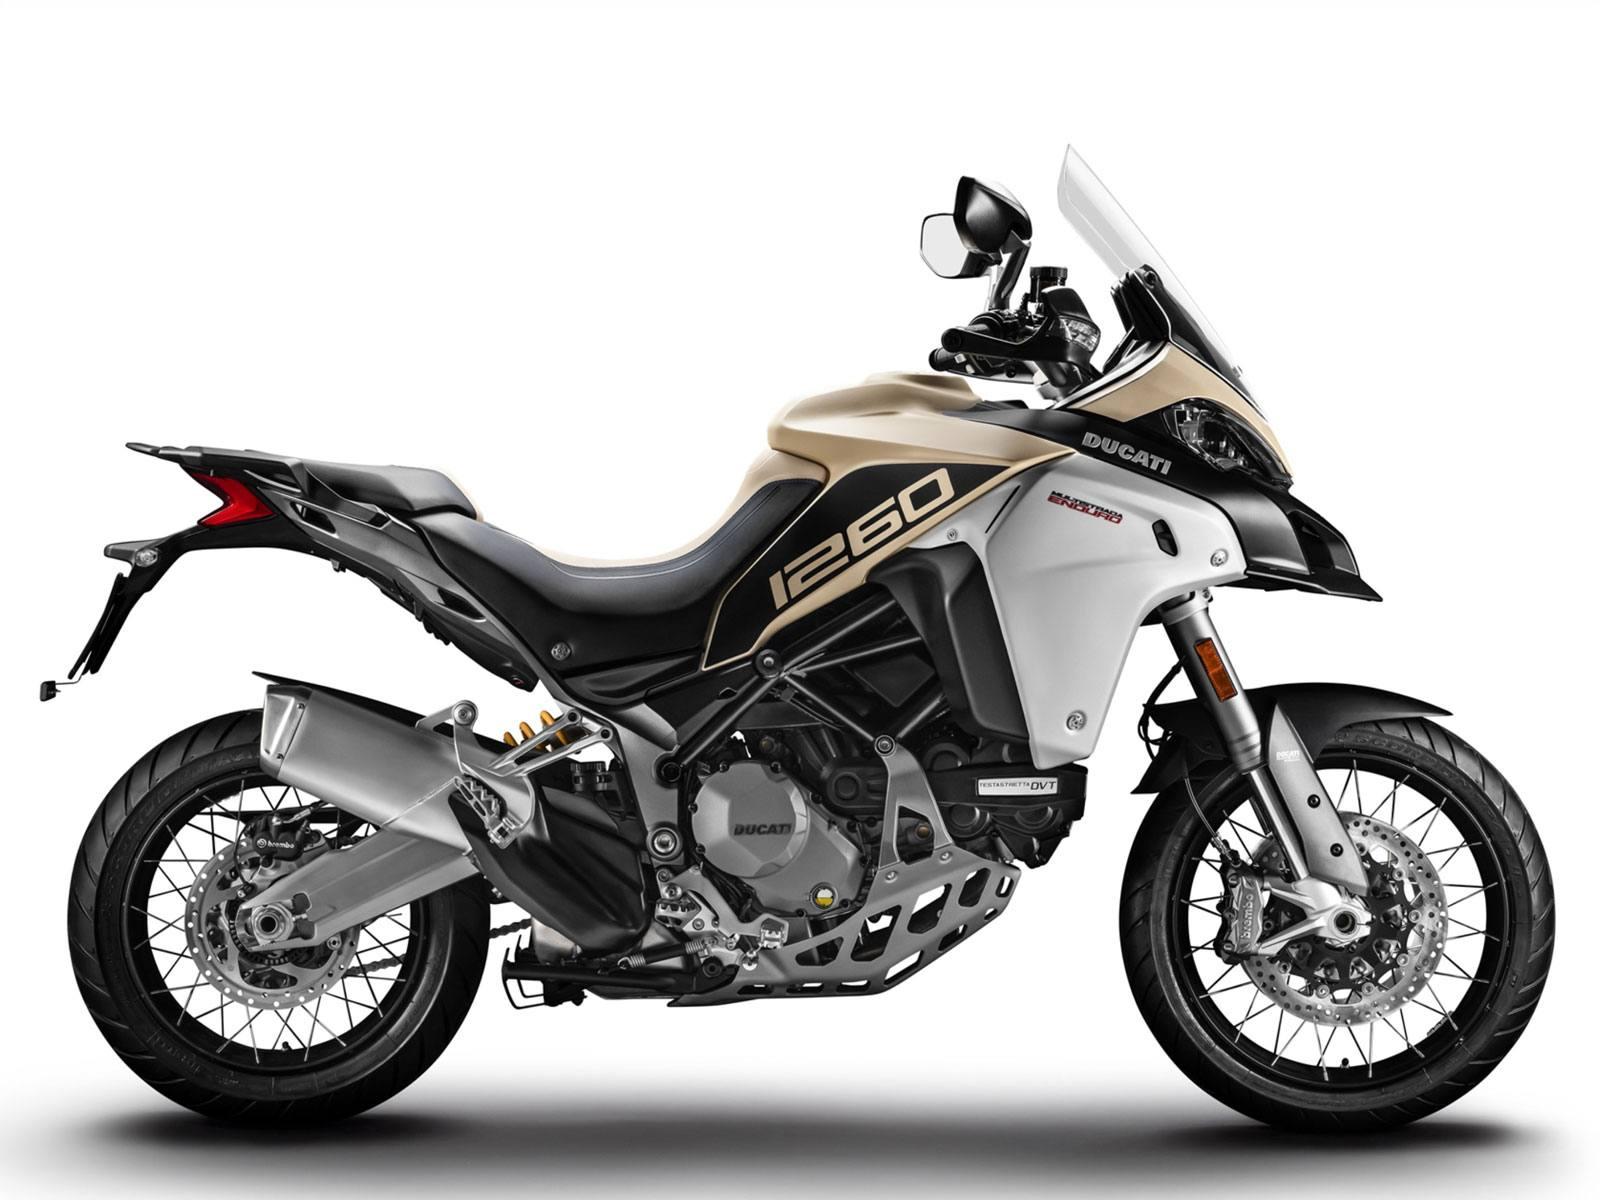 Мотоцикл DUCATI Multistrada 1260 Enduro - Sand (2019)